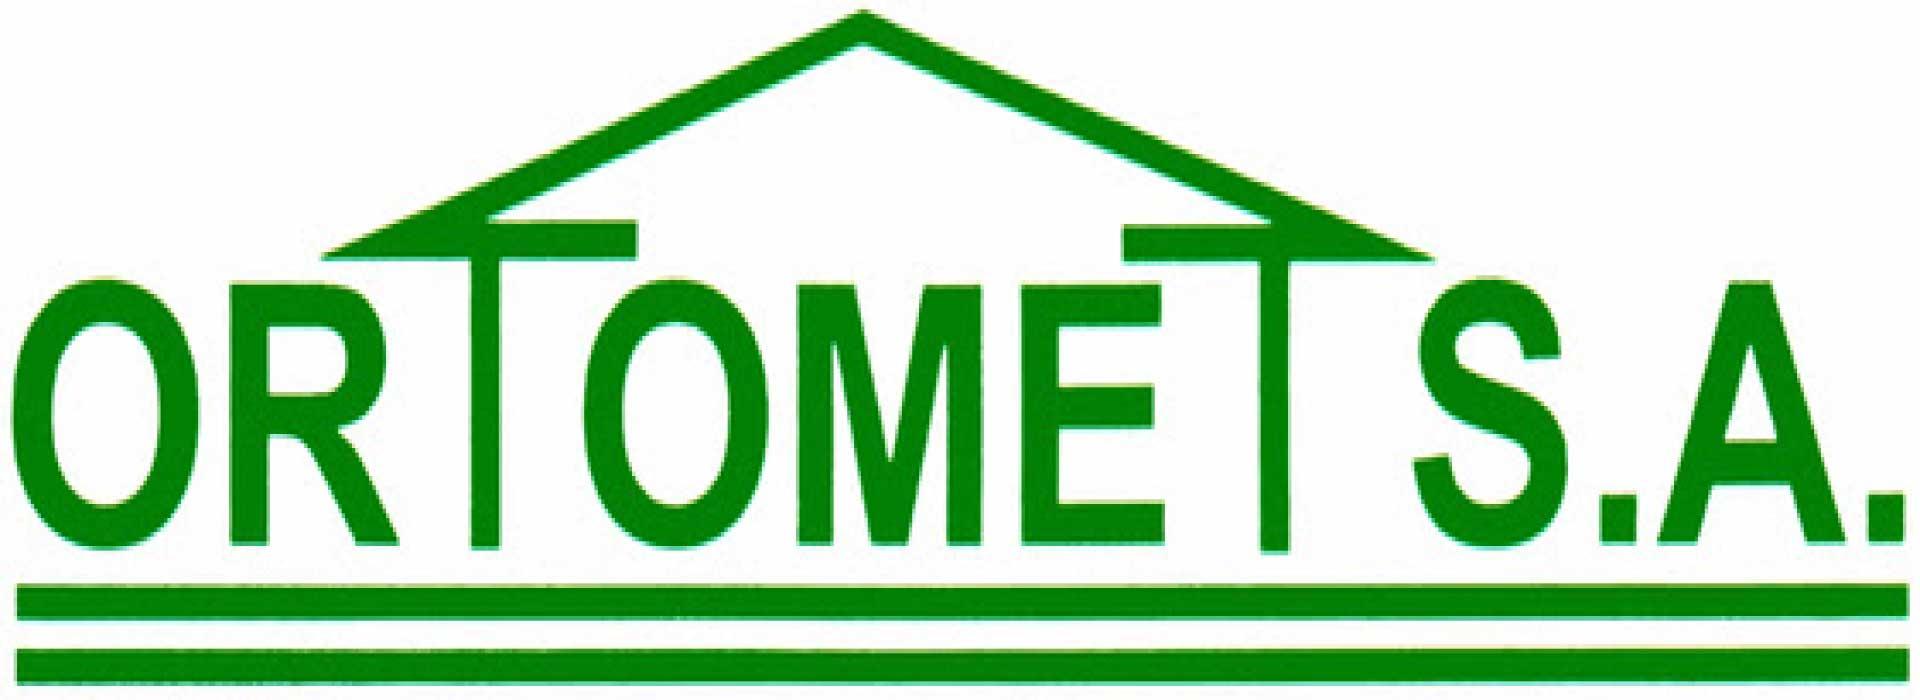 Ortomet - Todo para medir